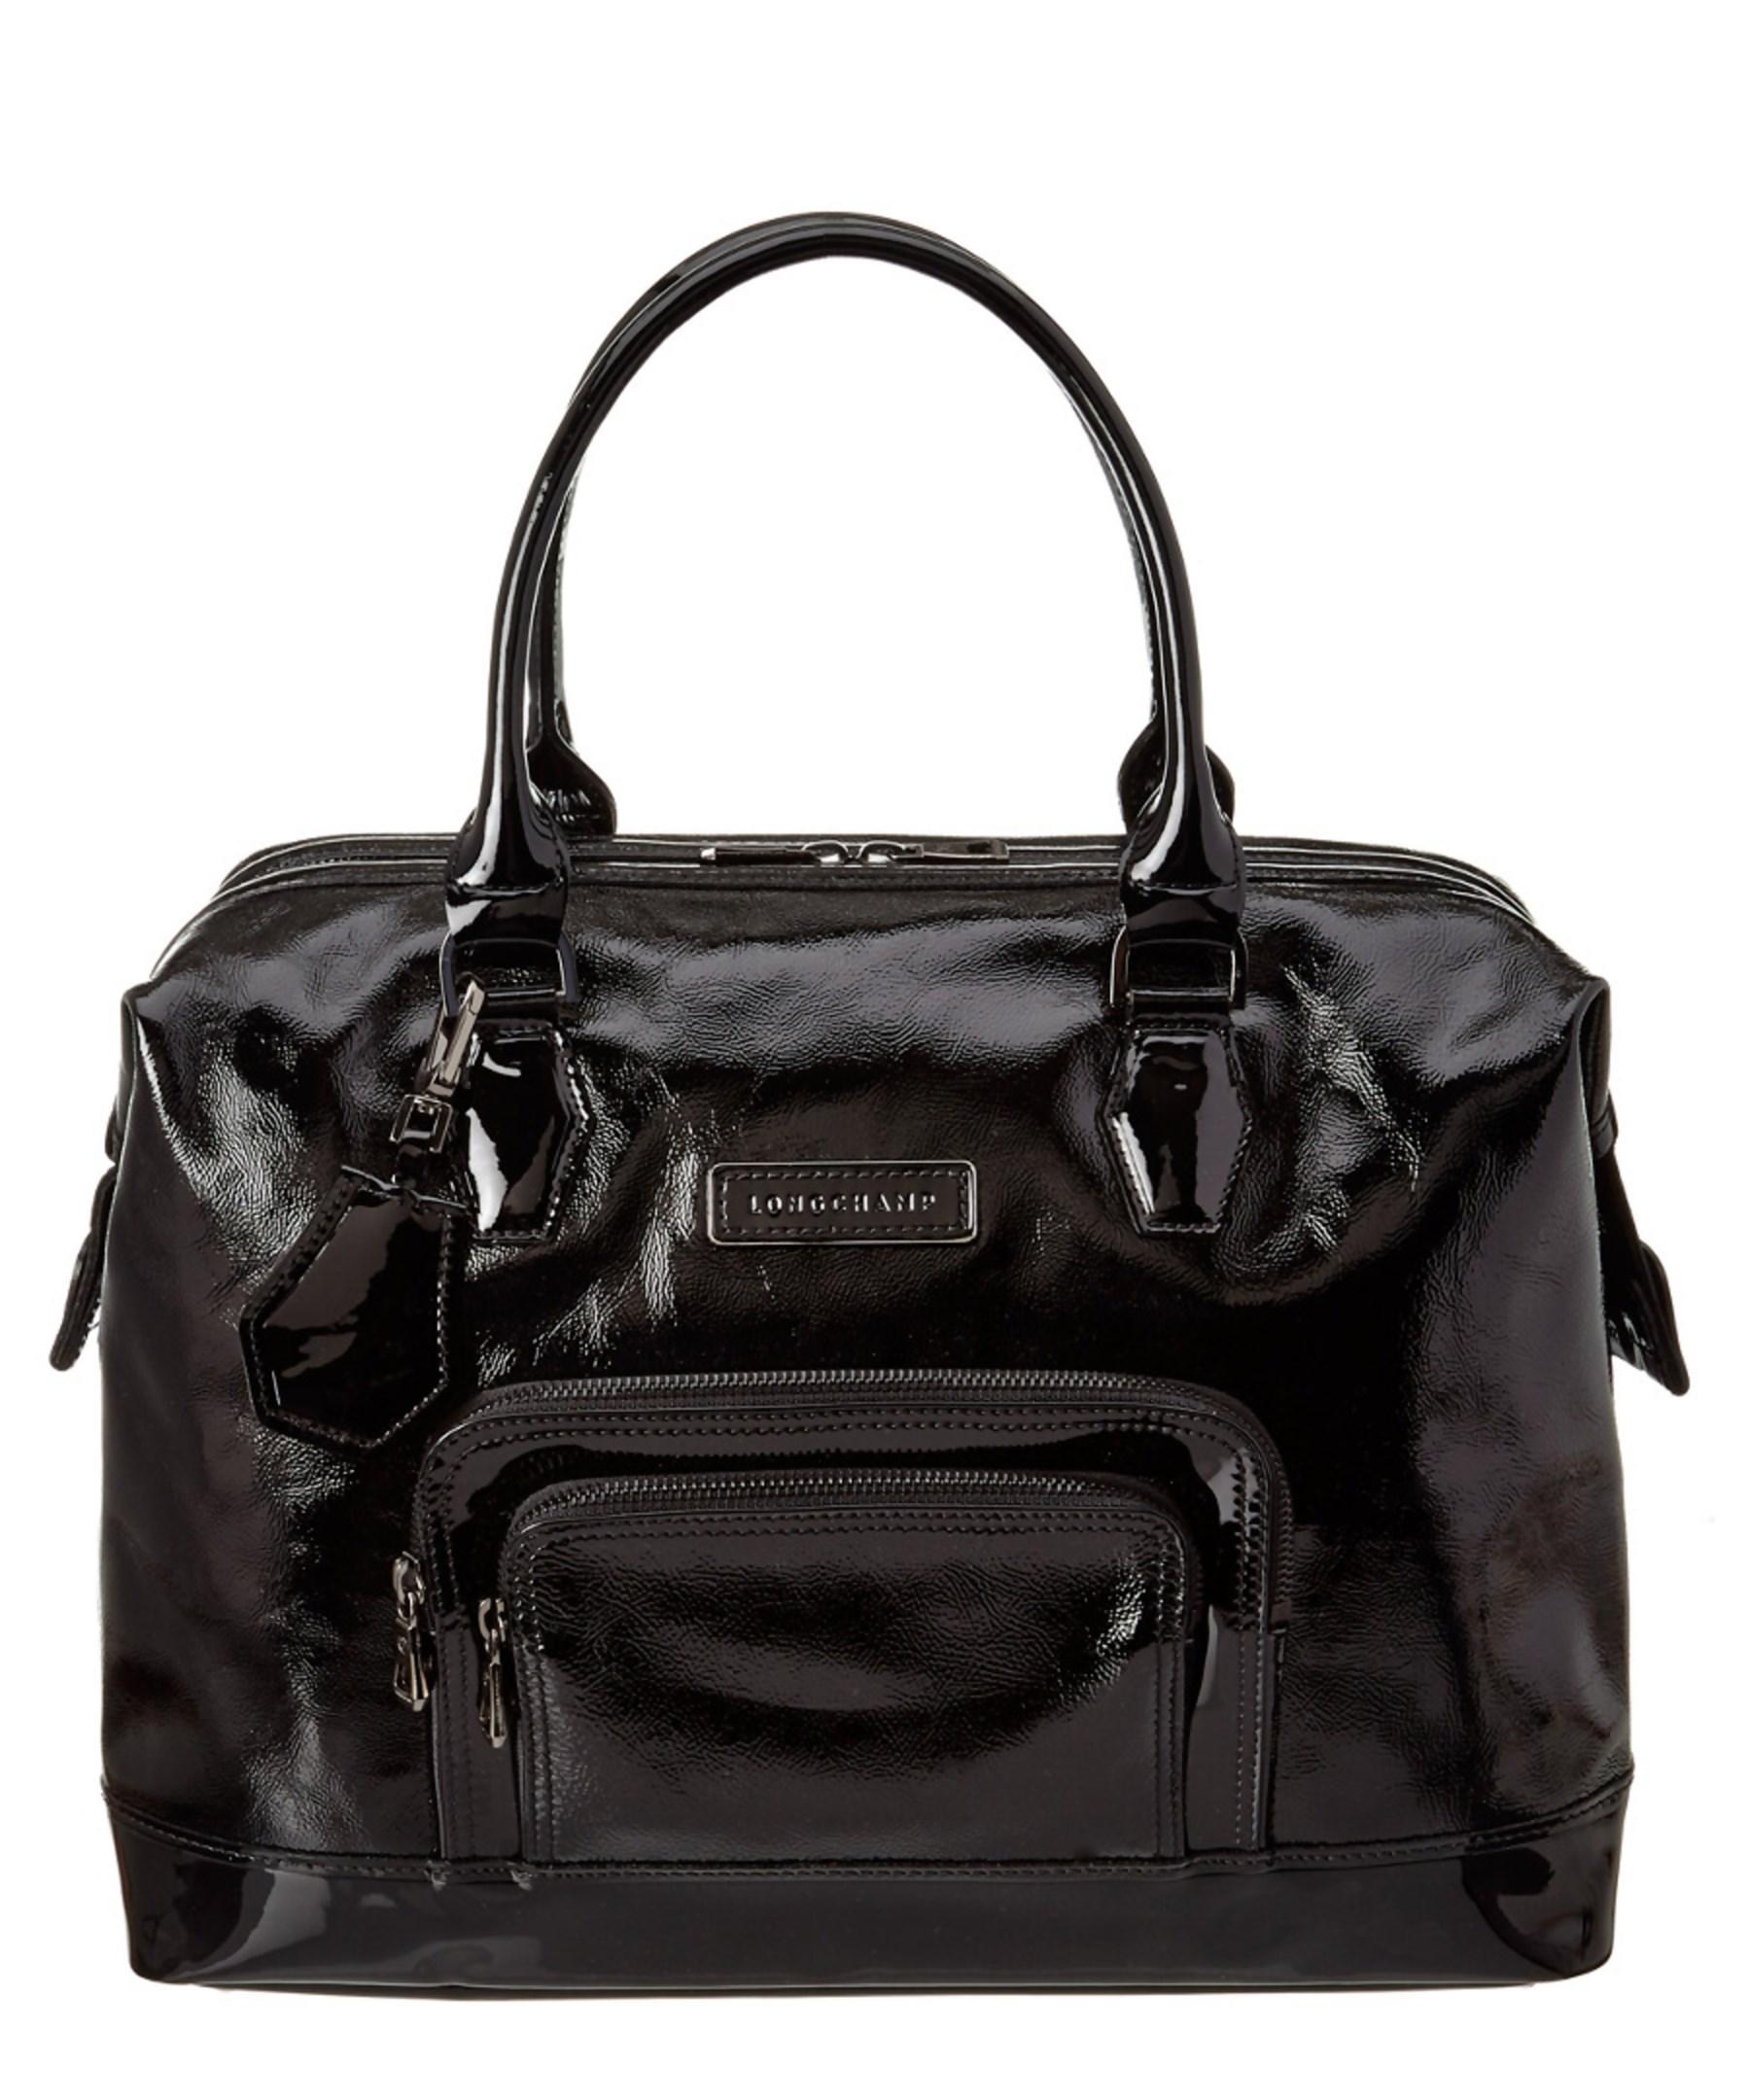 Lyst - Longchamp Legende Verni Patent Satchel in Black 86e778d2fa502